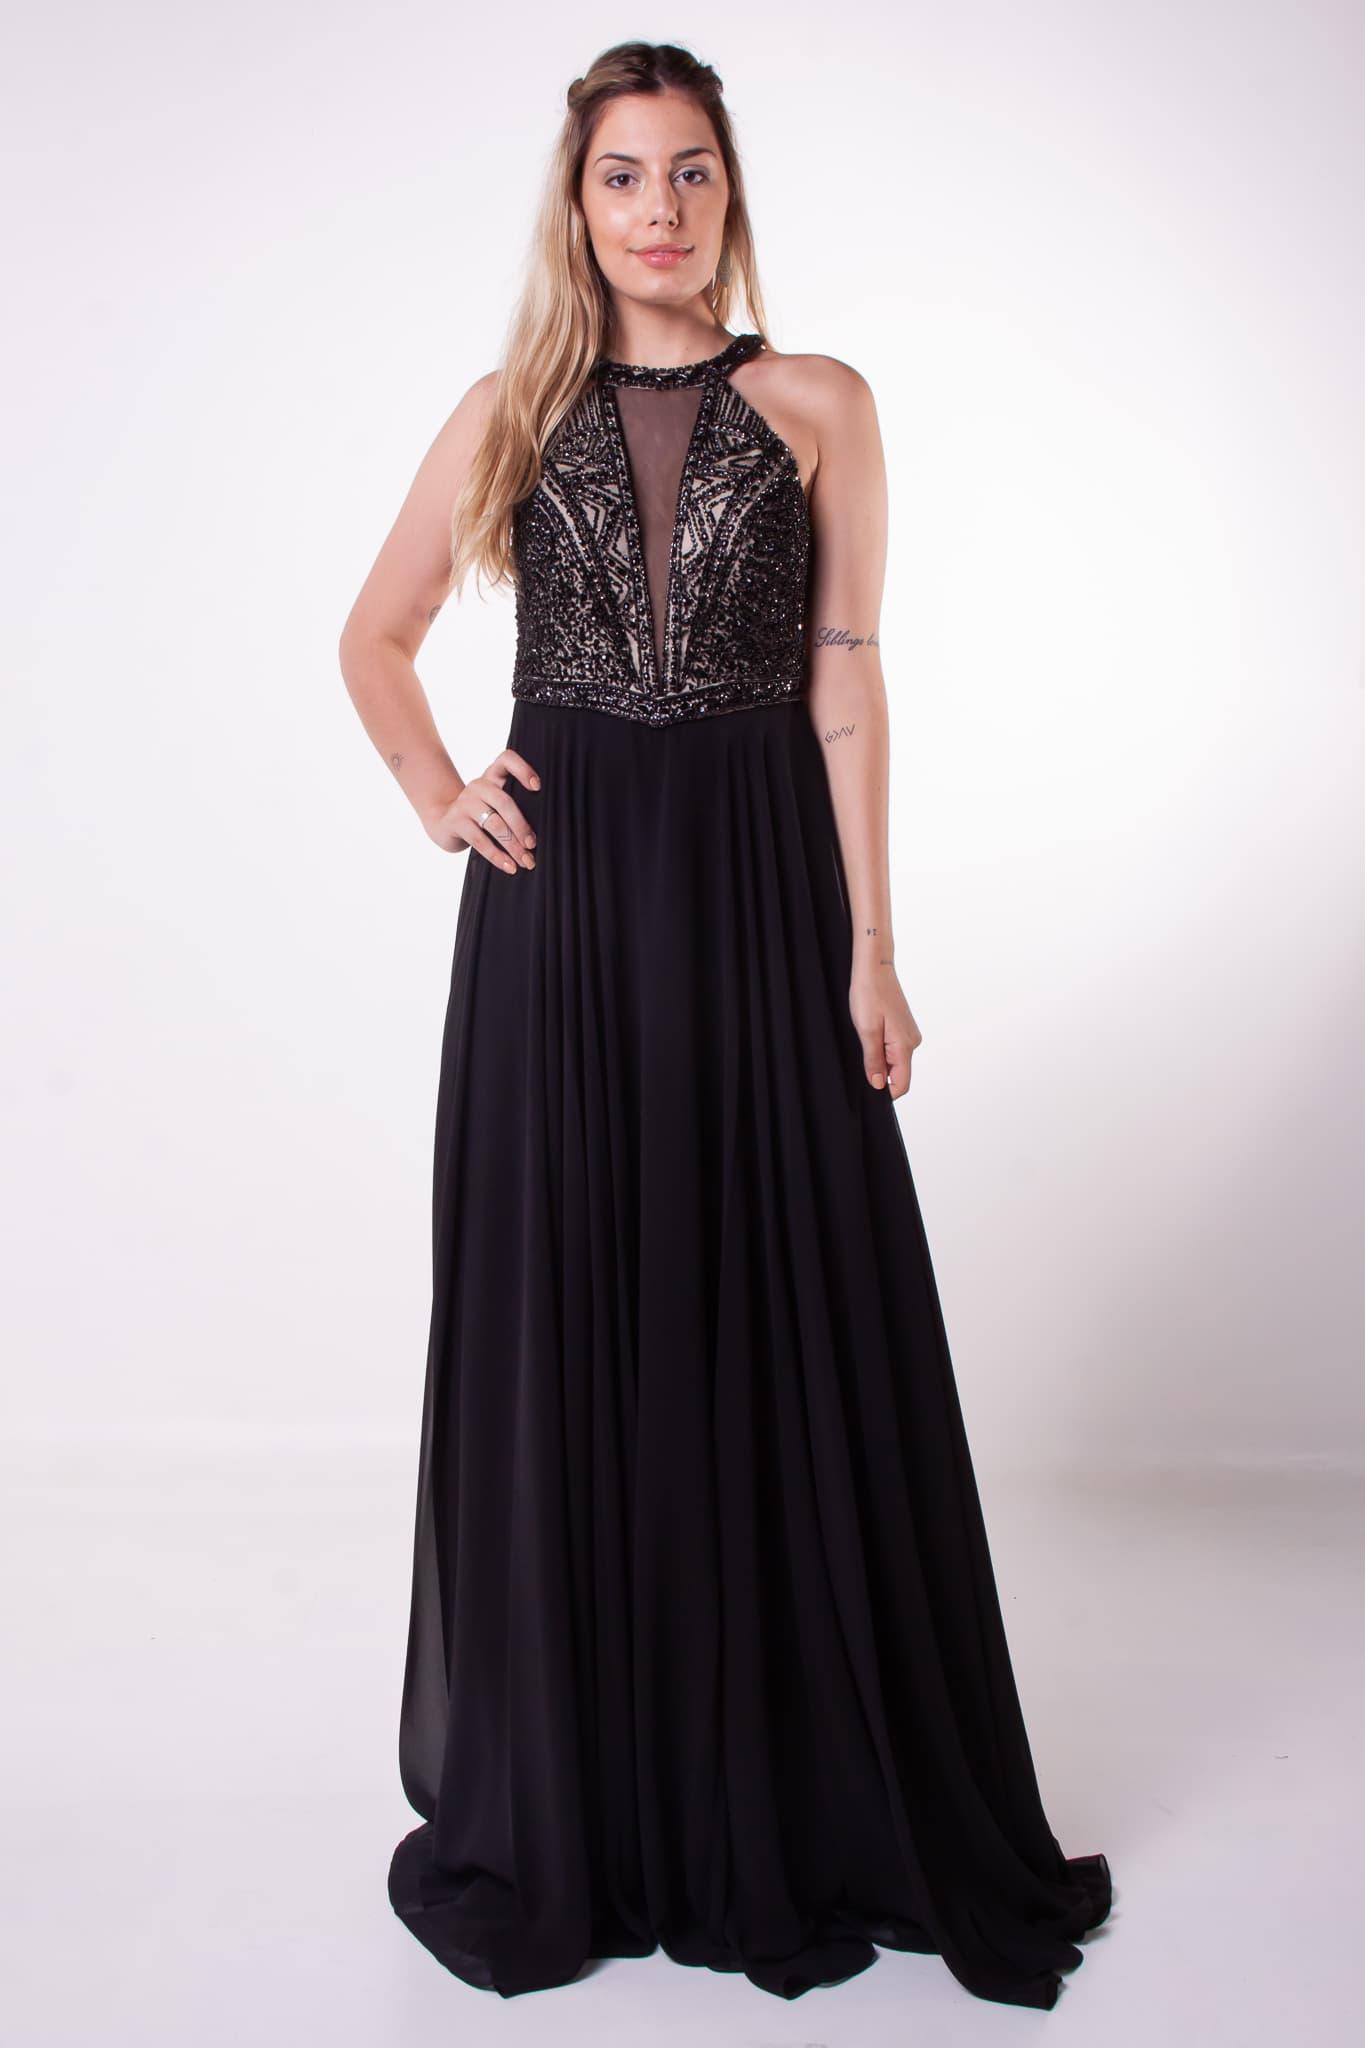 241 - Vestido preto fluido com corpo bordado